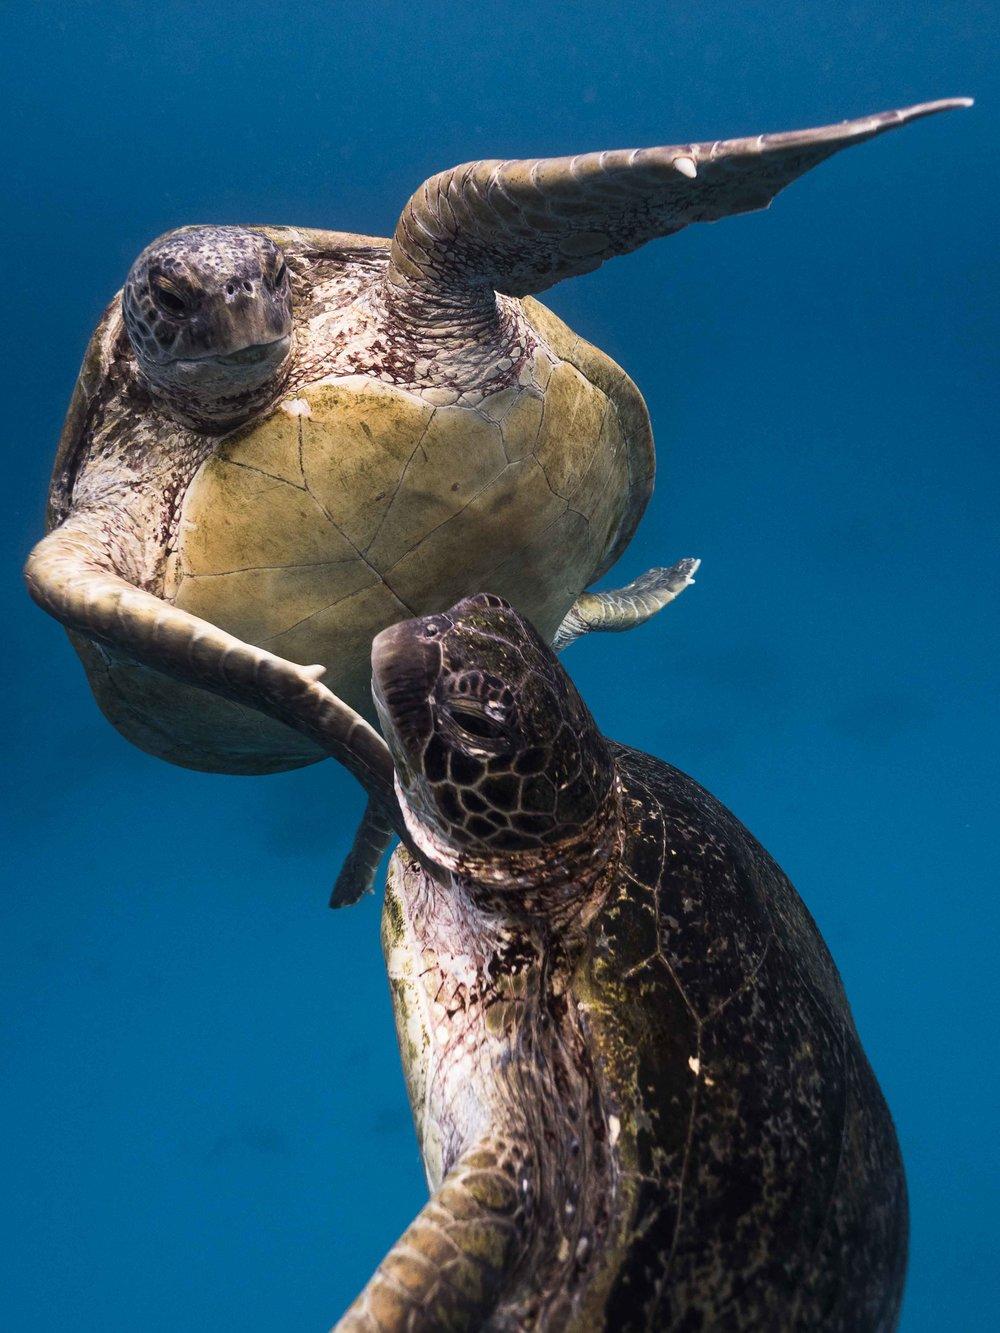 19. Turtle Love 1/10 - $1600